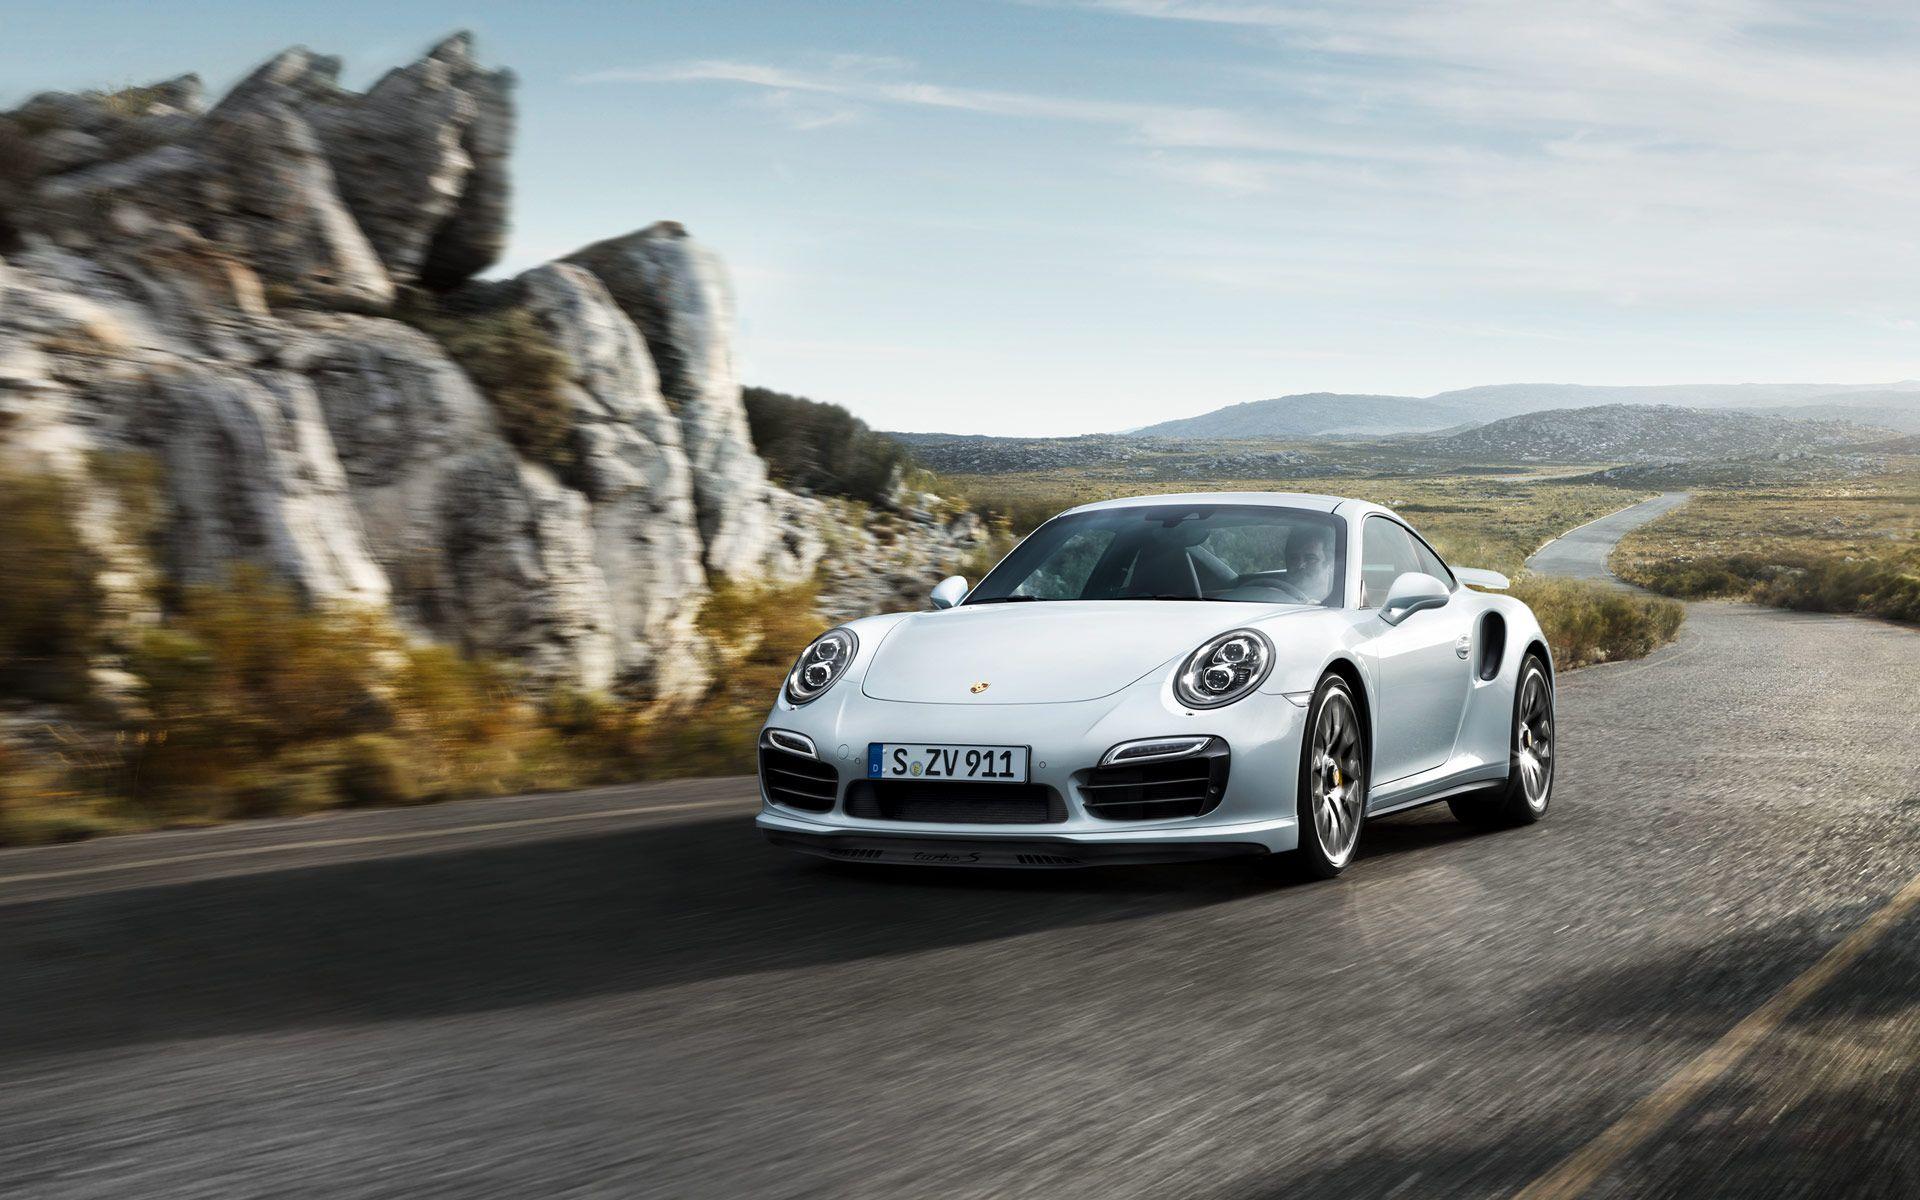 Porsche Wallpaper Porsche 911 Turbo Porsche 911 Turbo S